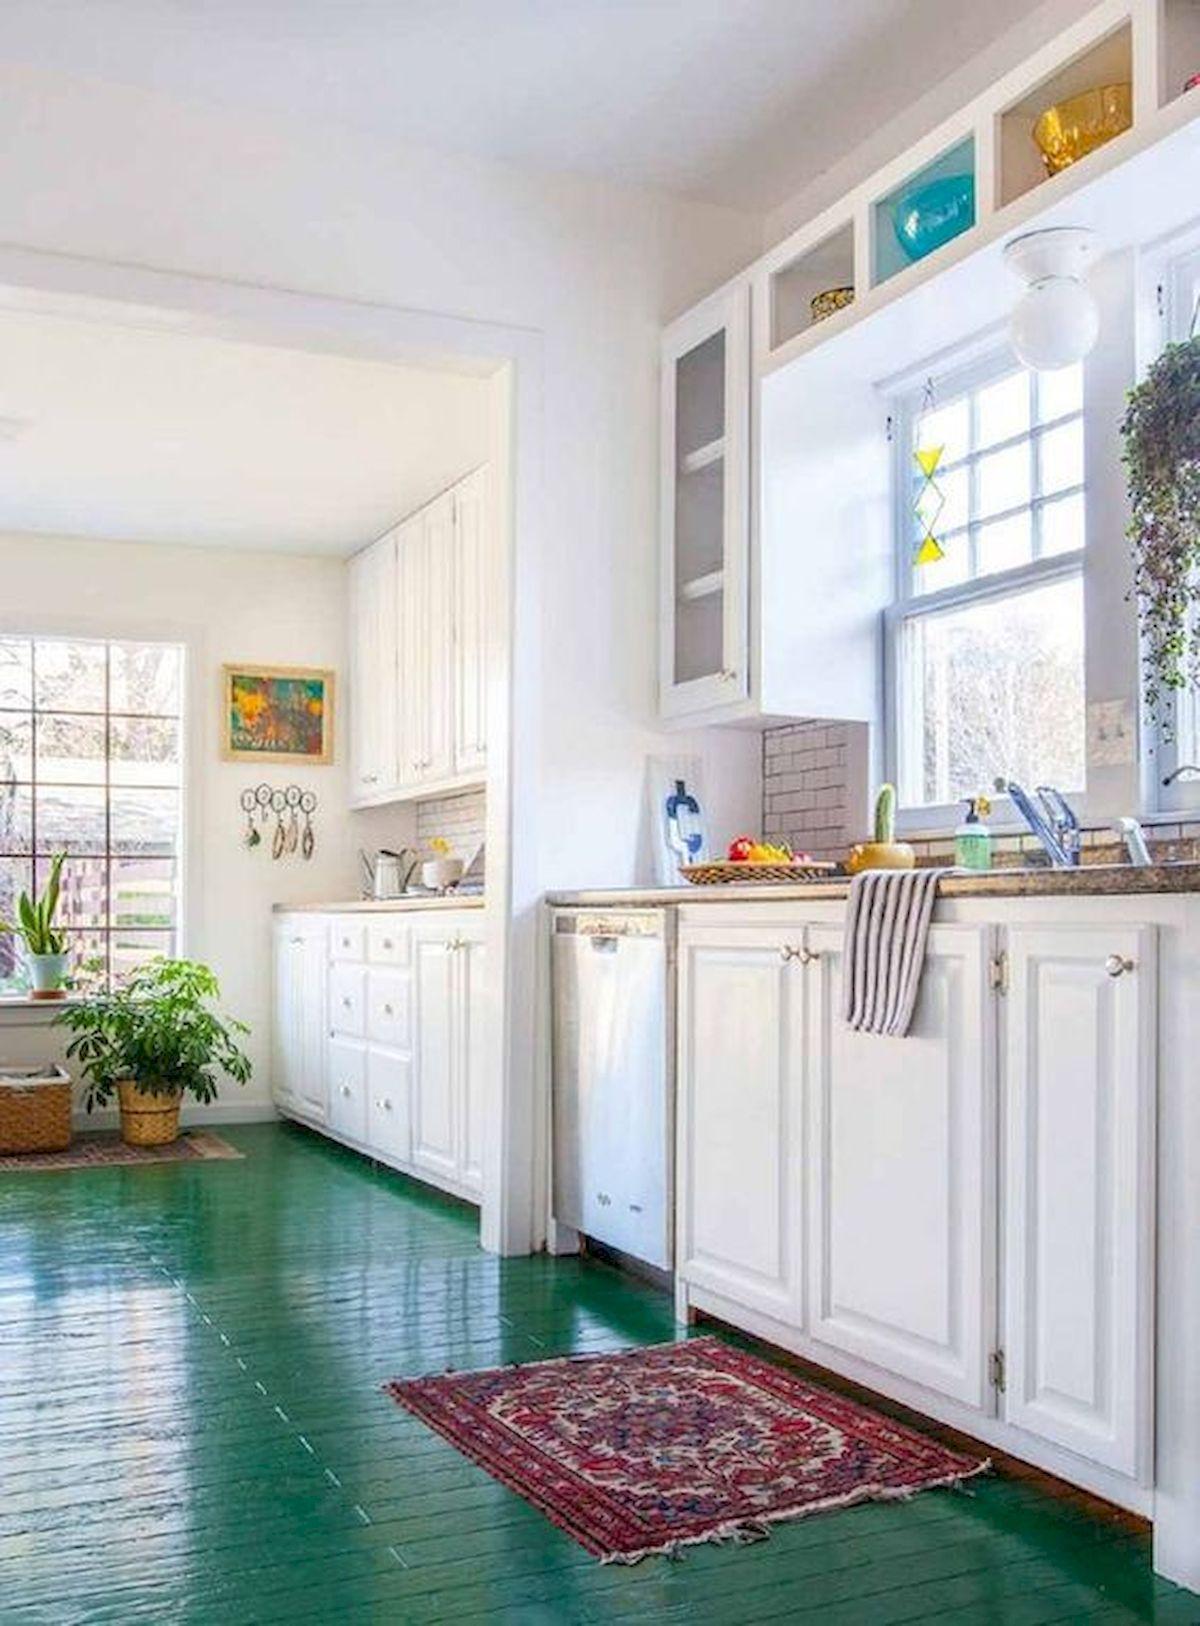 40 Best Tile Flooring Designs Ideas For Modern Kitchen (11)